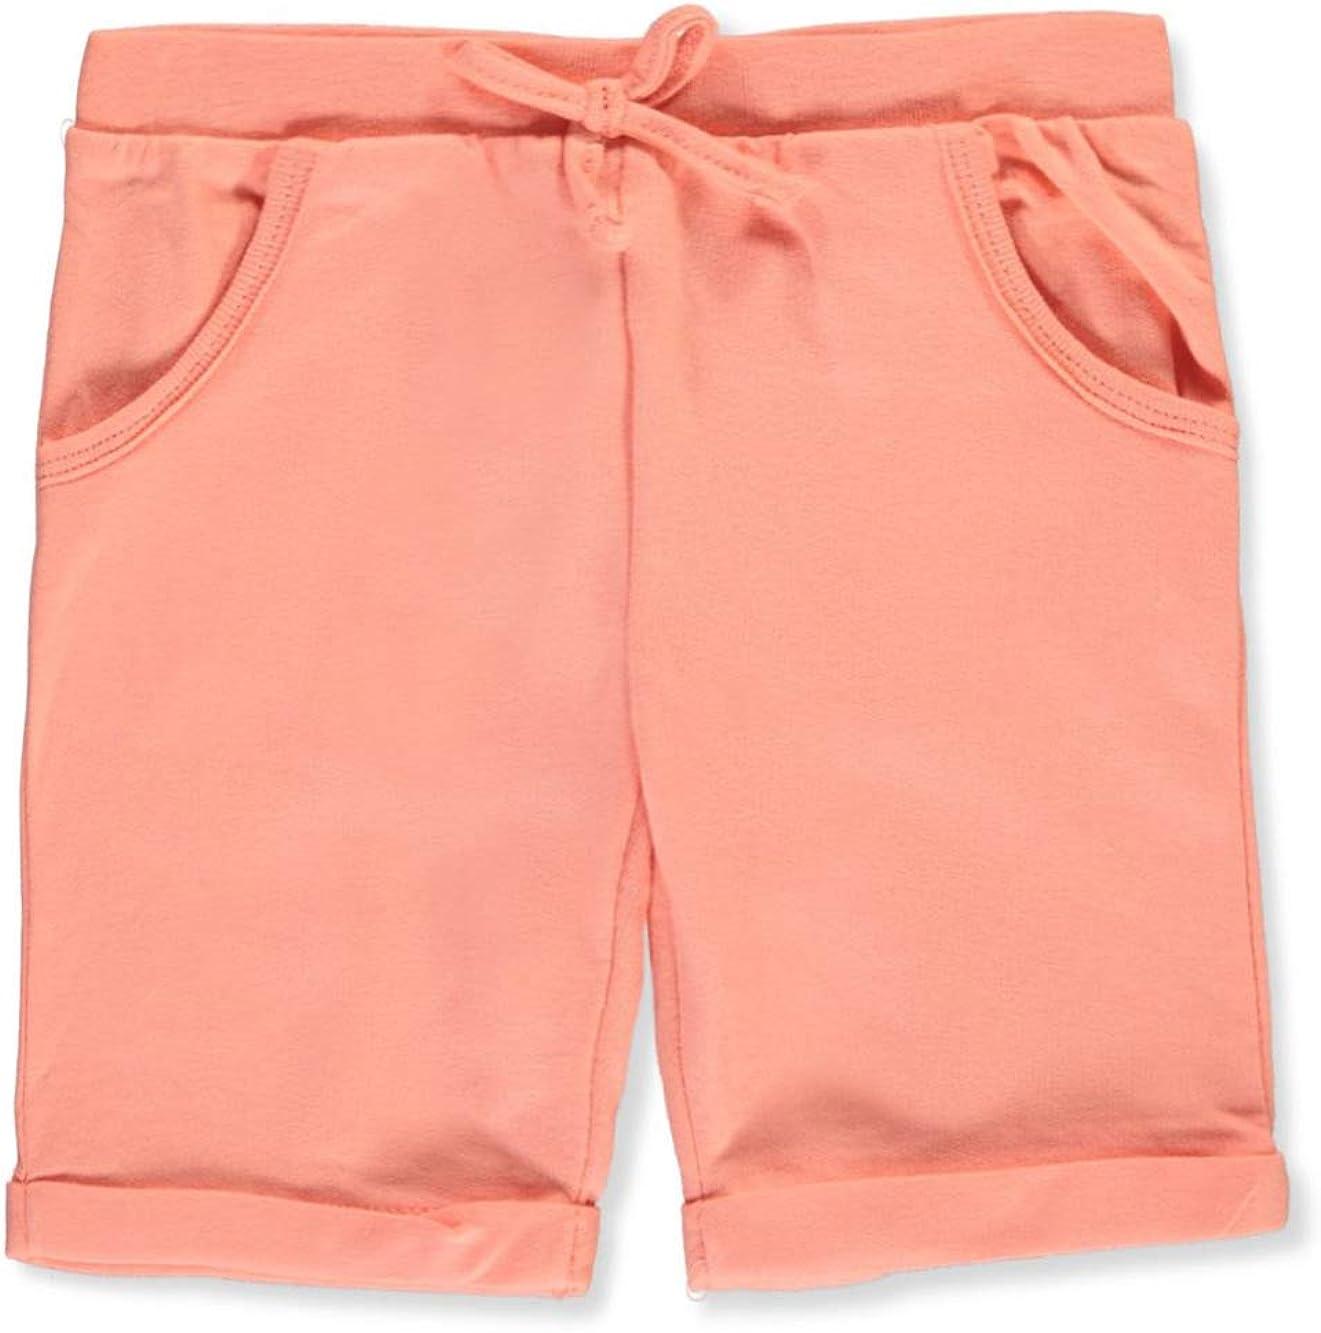 Peach Real Love Toddler Fleece Bermuda Shorts 4t